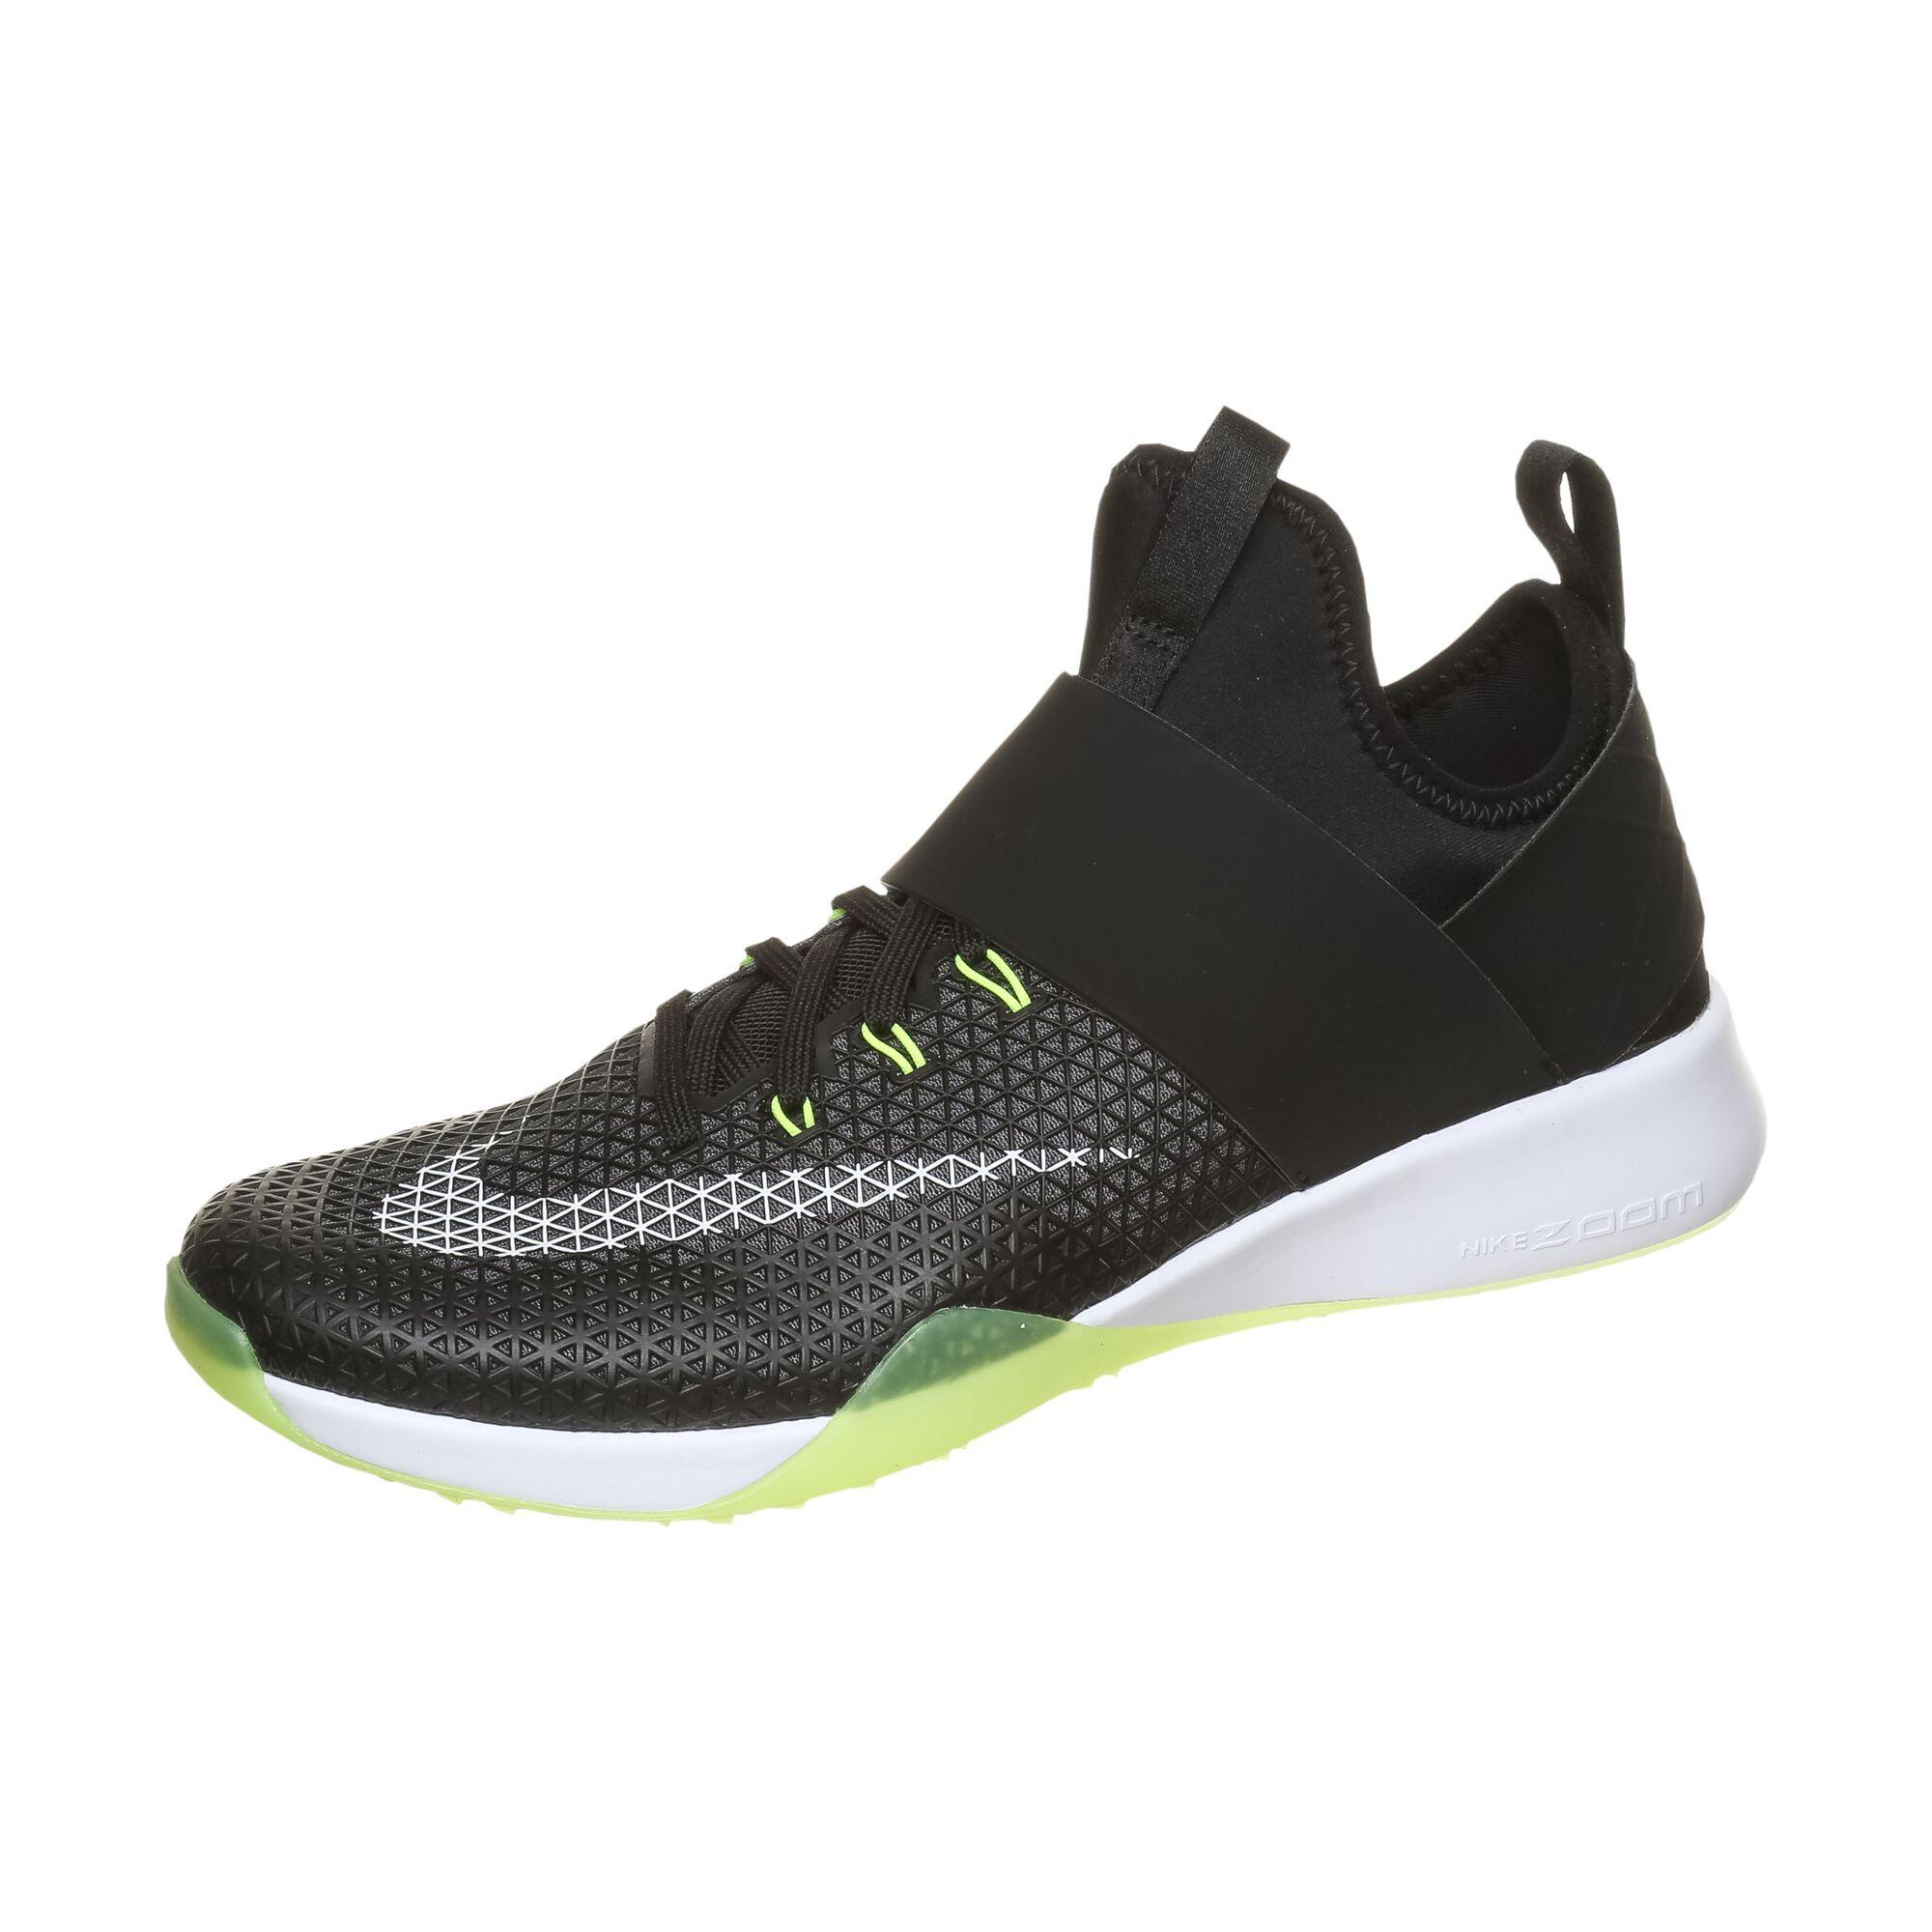 51087dc1e3081 buy Nike Air Zoom Strong Fitness Shoe Women - Black